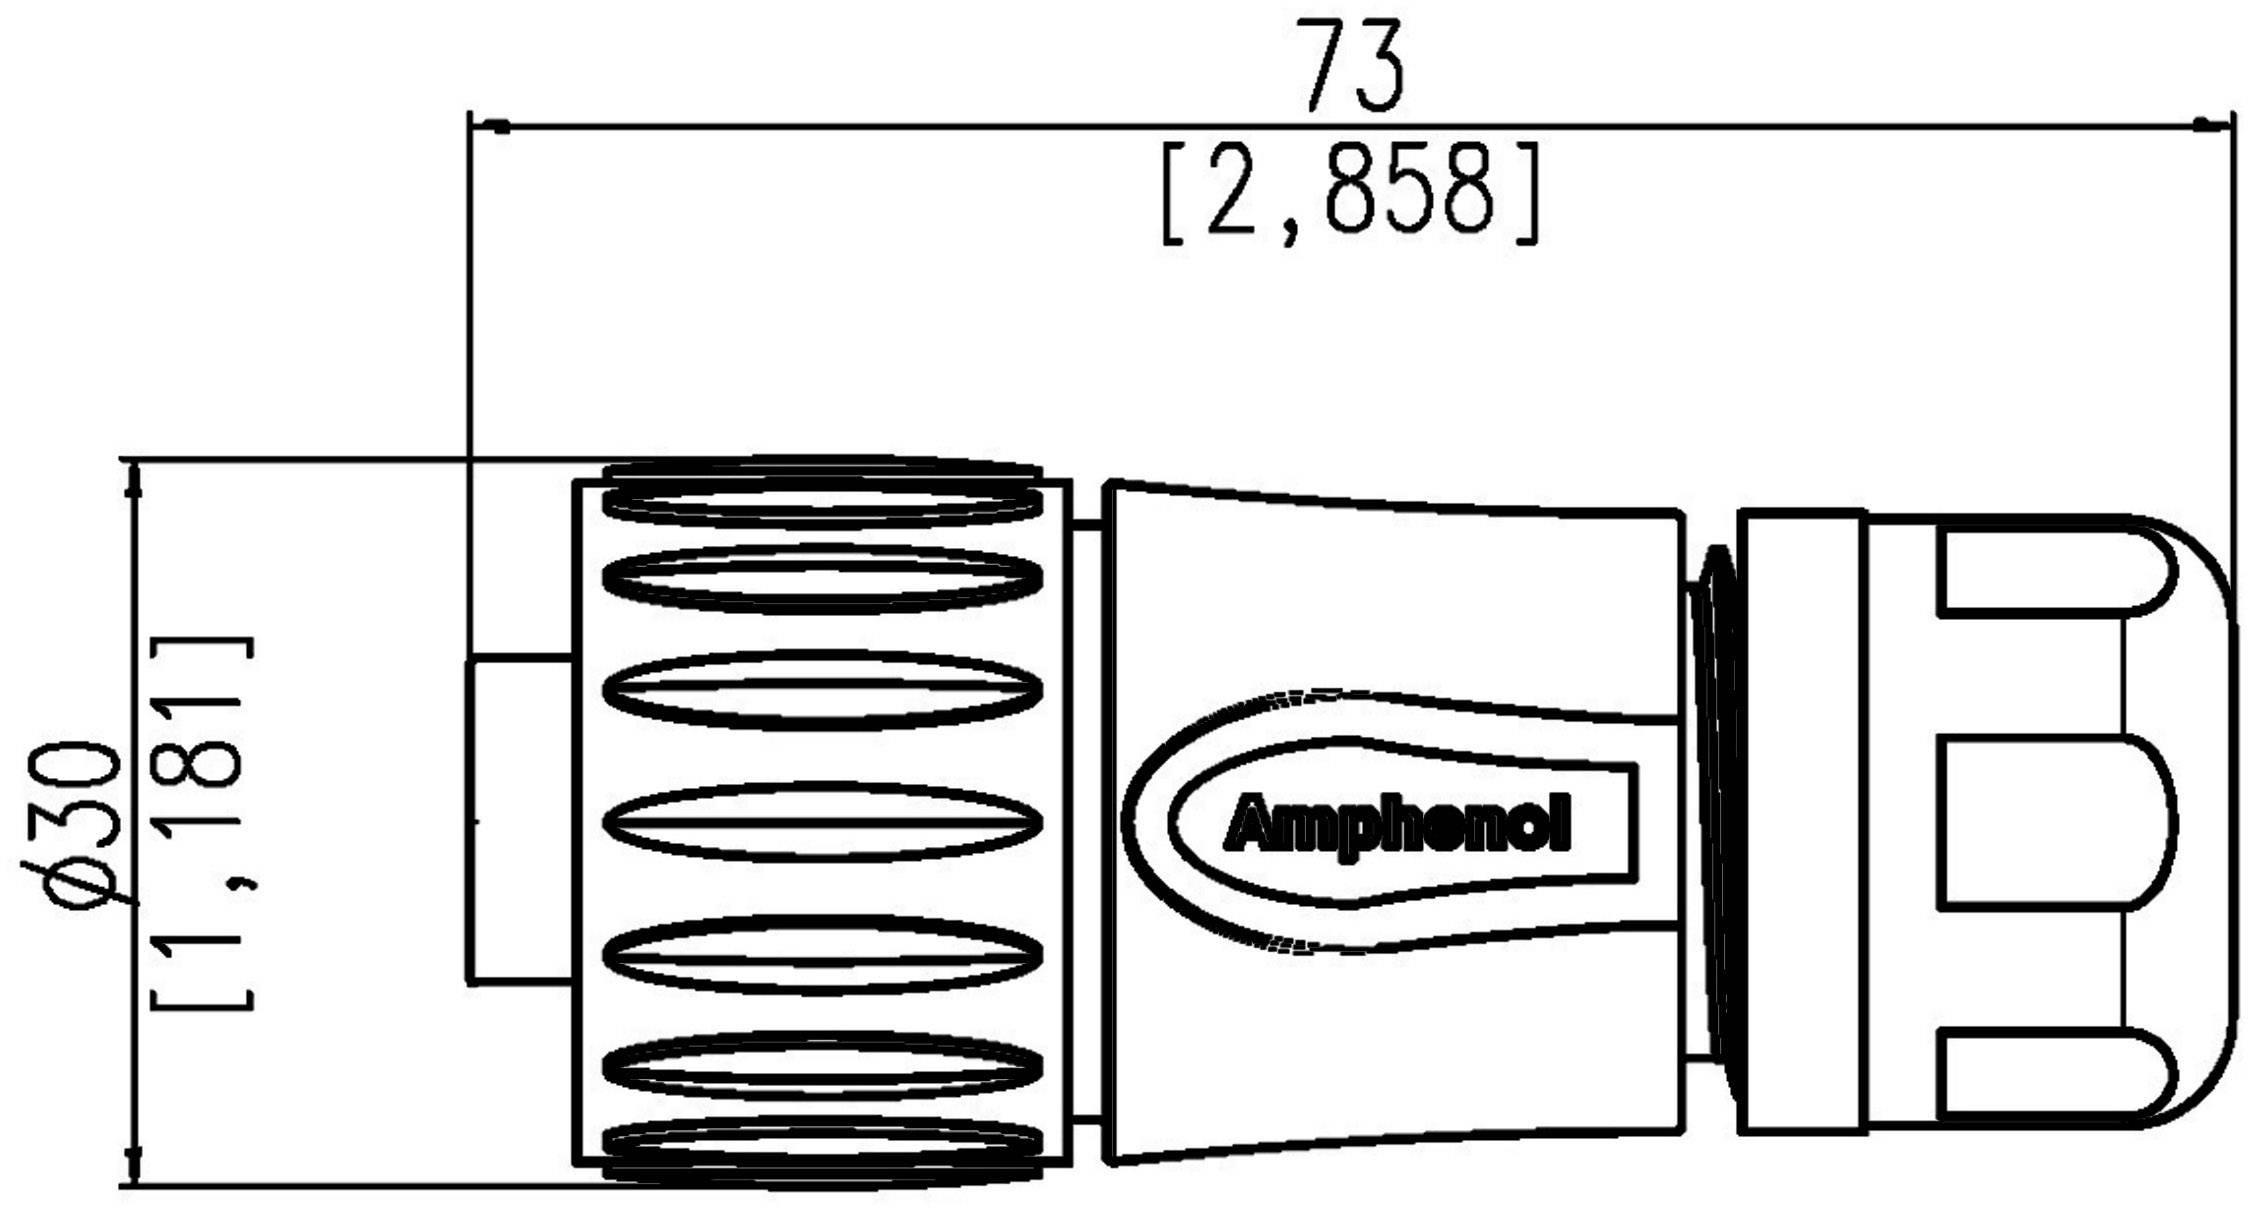 Kabelový konektor 3+PE Amphenol C016 20H003 110 12, černá